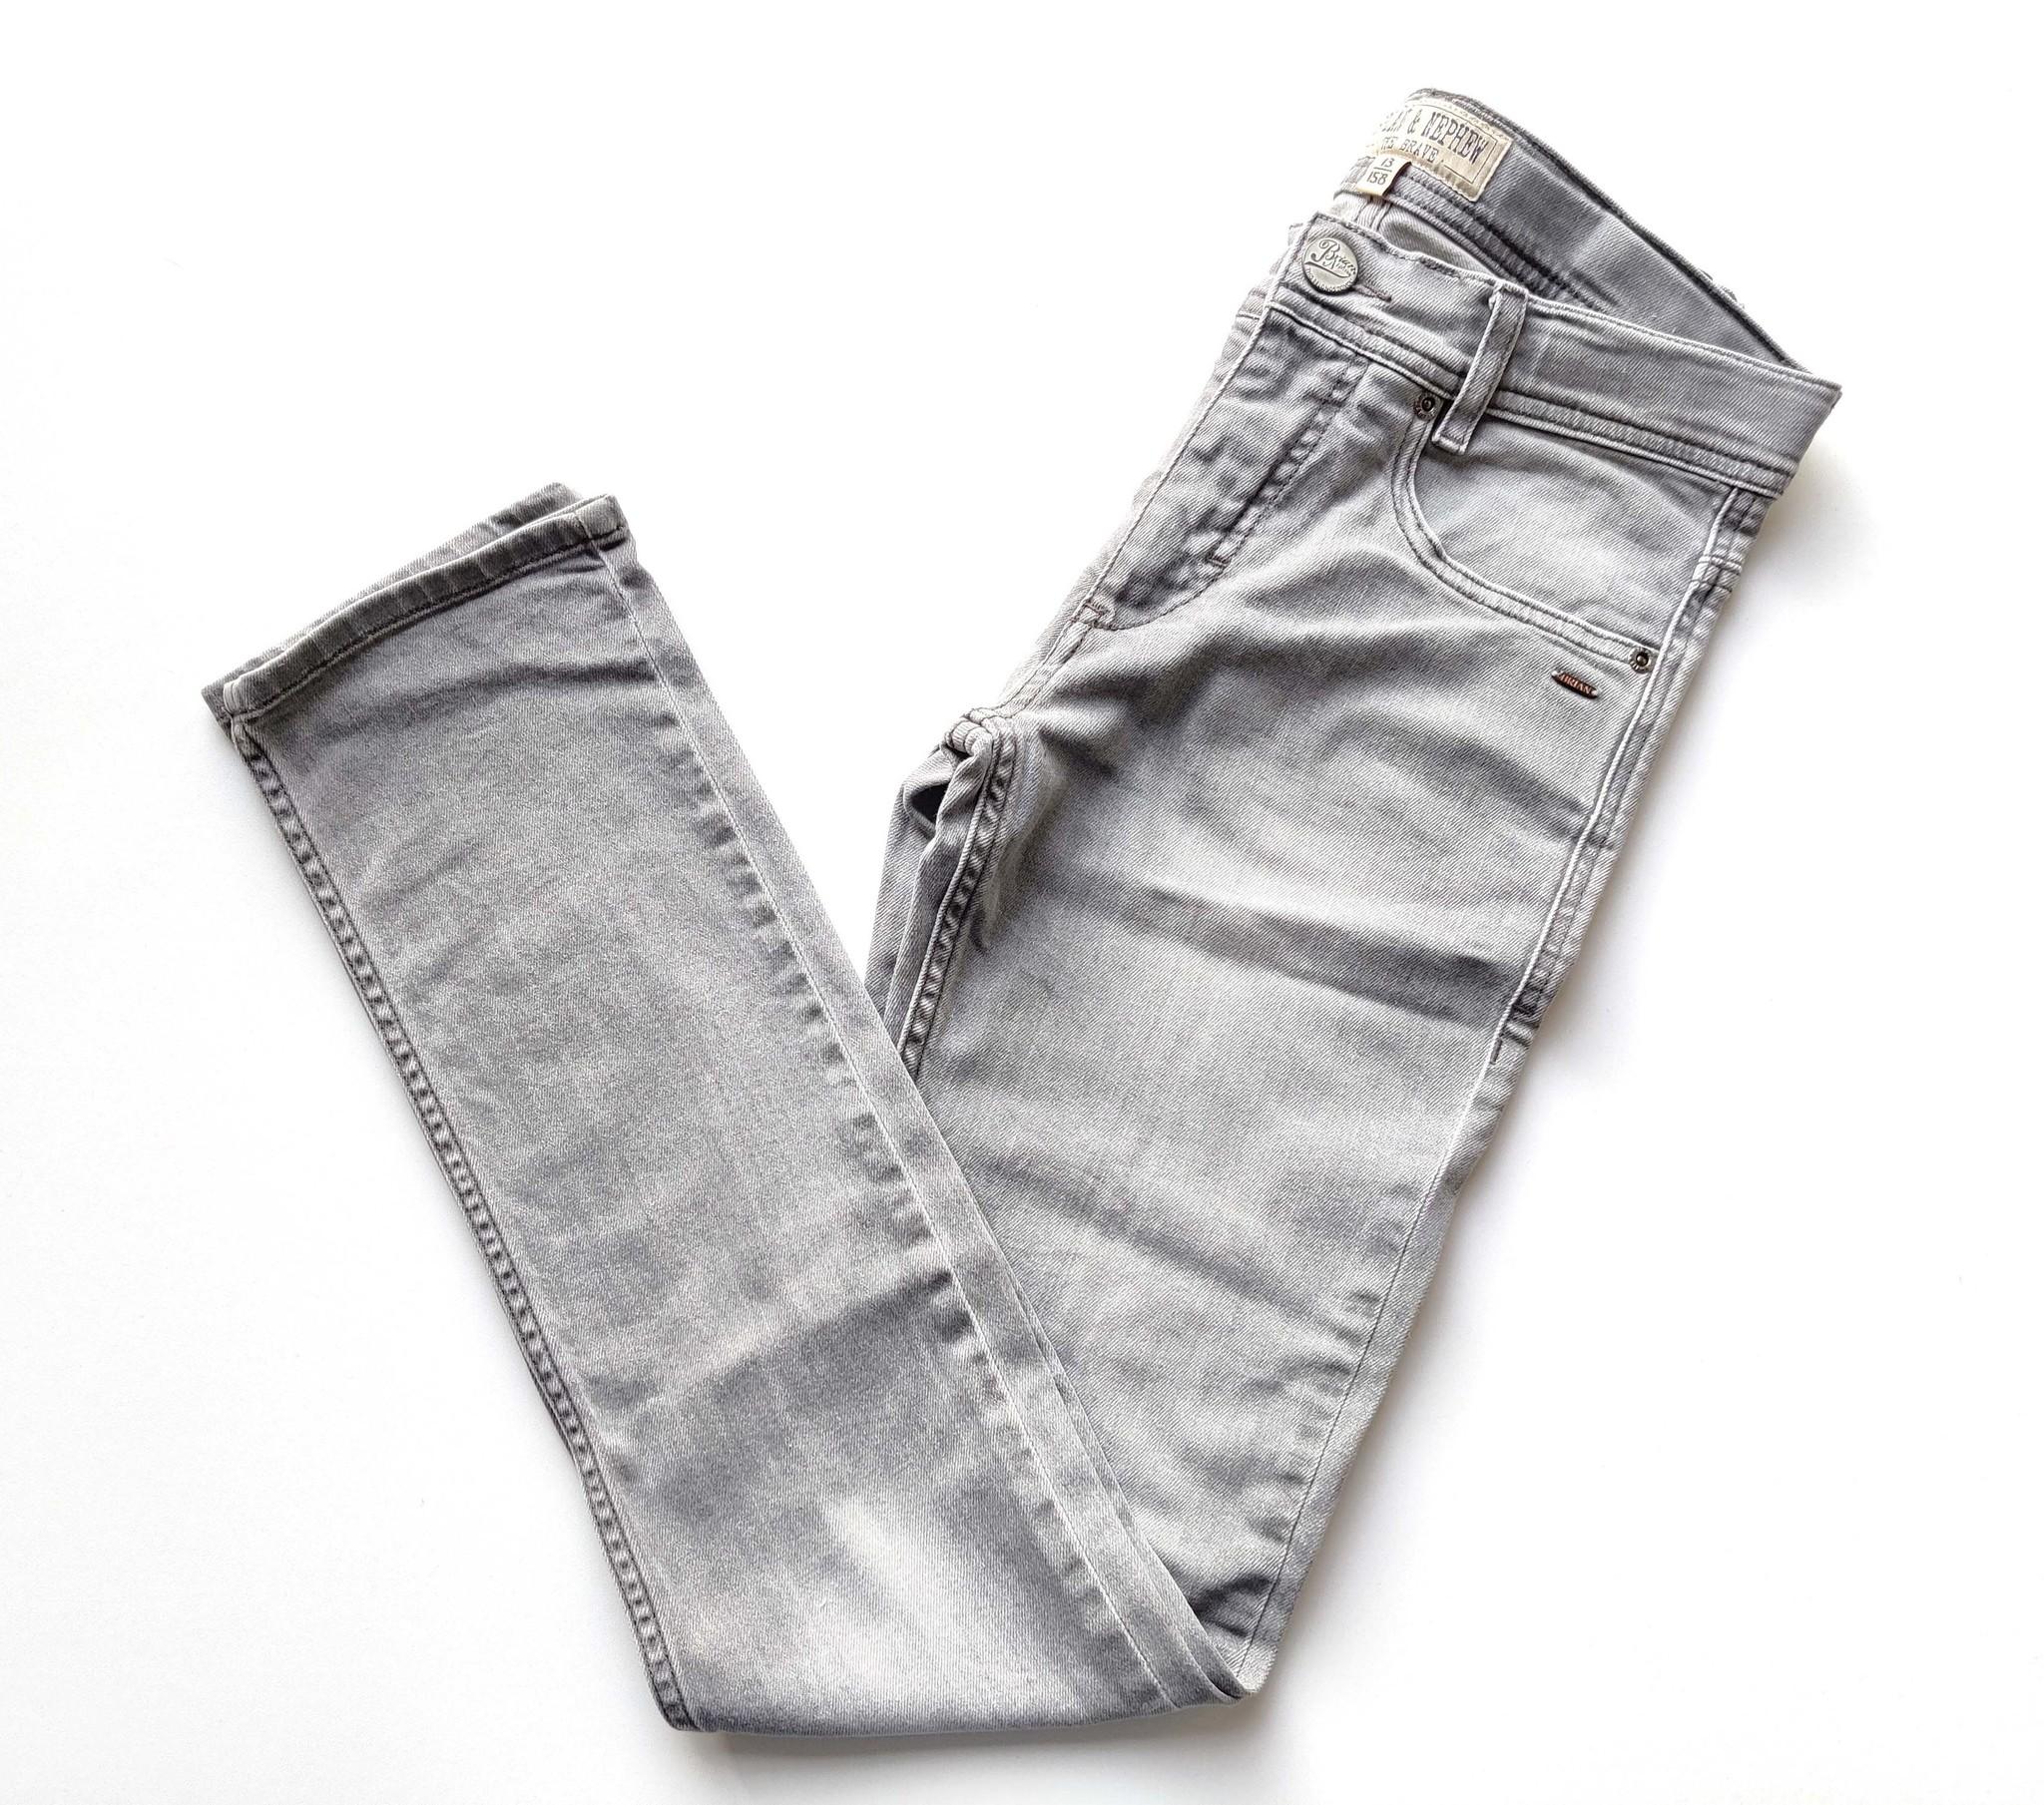 Skinny jeans Brian and Nephew-1